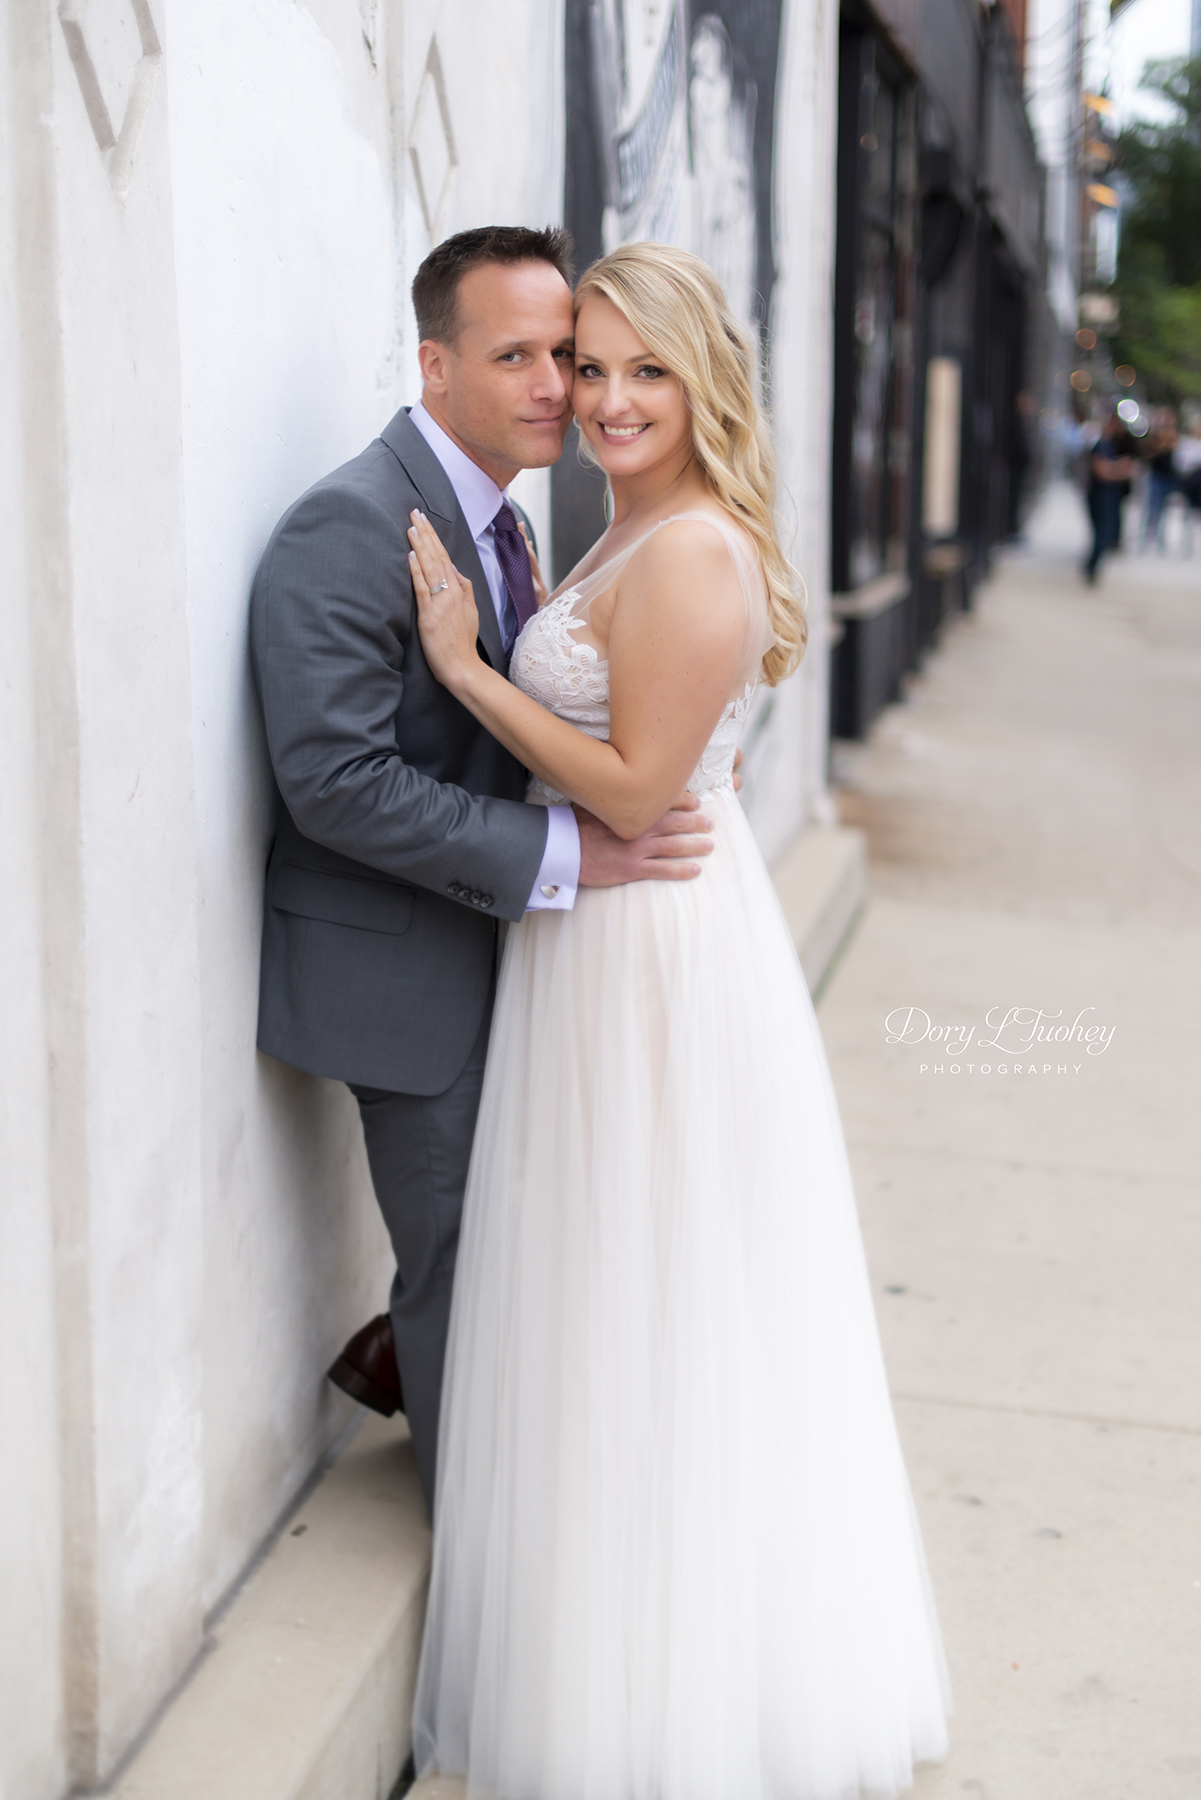 Rookery_chicago_dory_photographer_wedding_stairs_bhldn_love_dawson_09.jpg